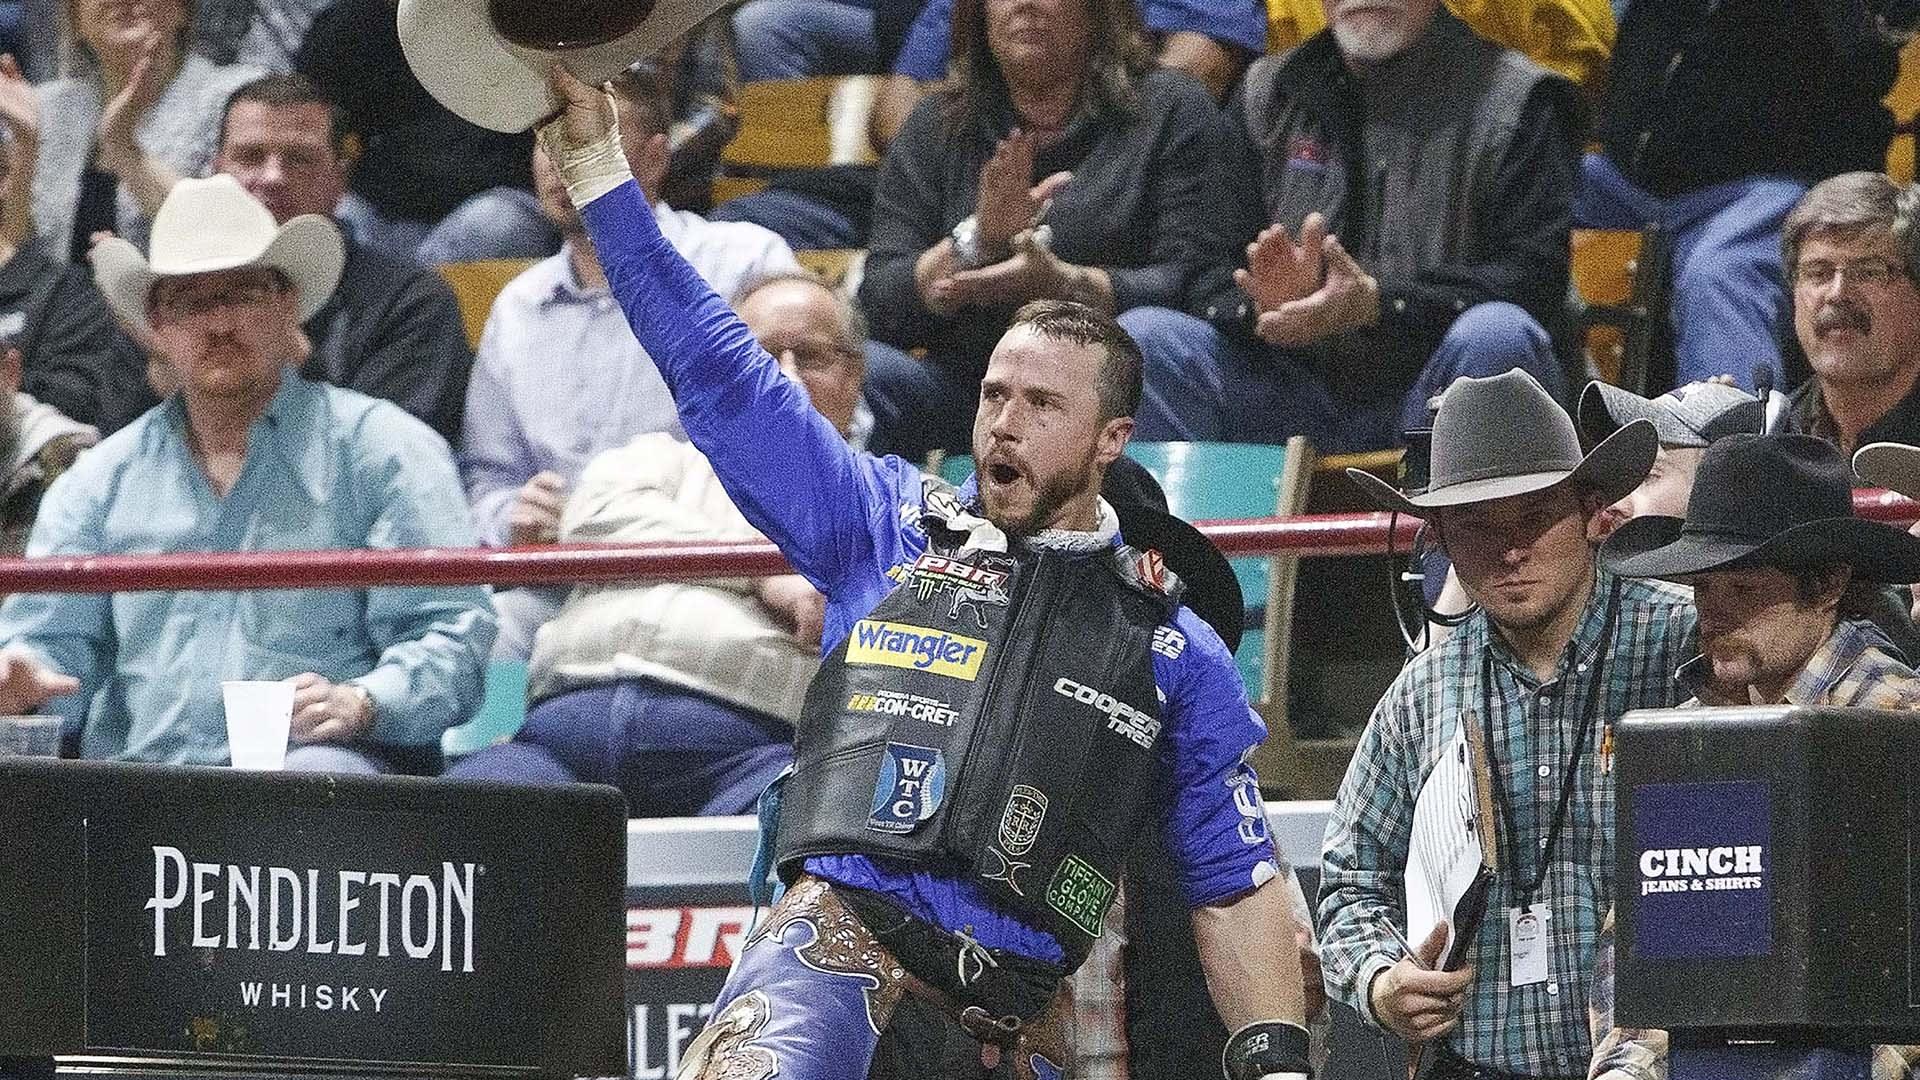 Nance wins PBR event in Denver in fallen bull rider's memory